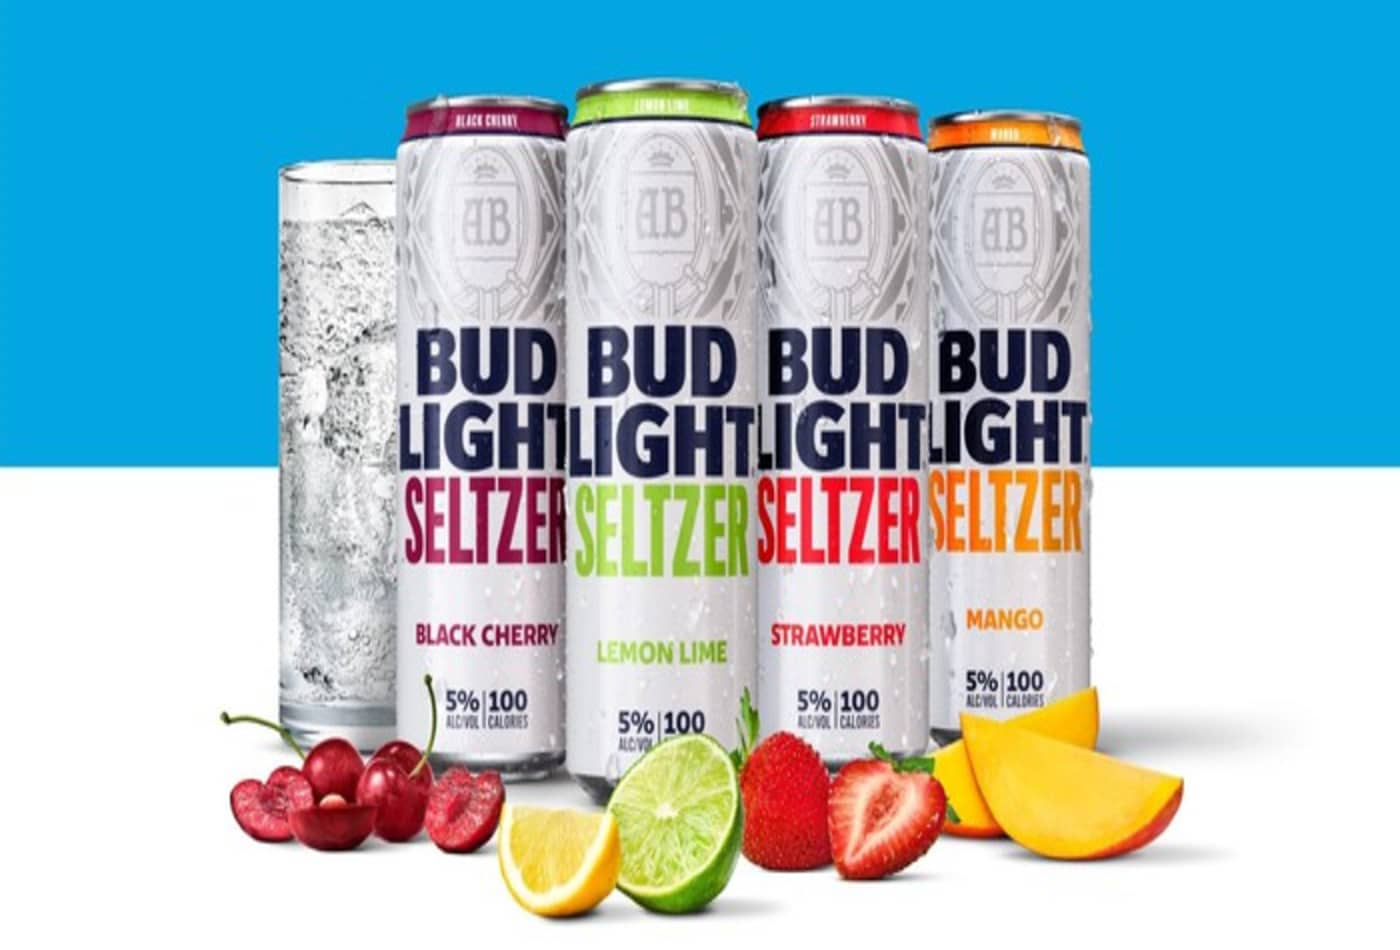 Anheuser-Busch invests $100 million in hard seltzer, the new drink craze